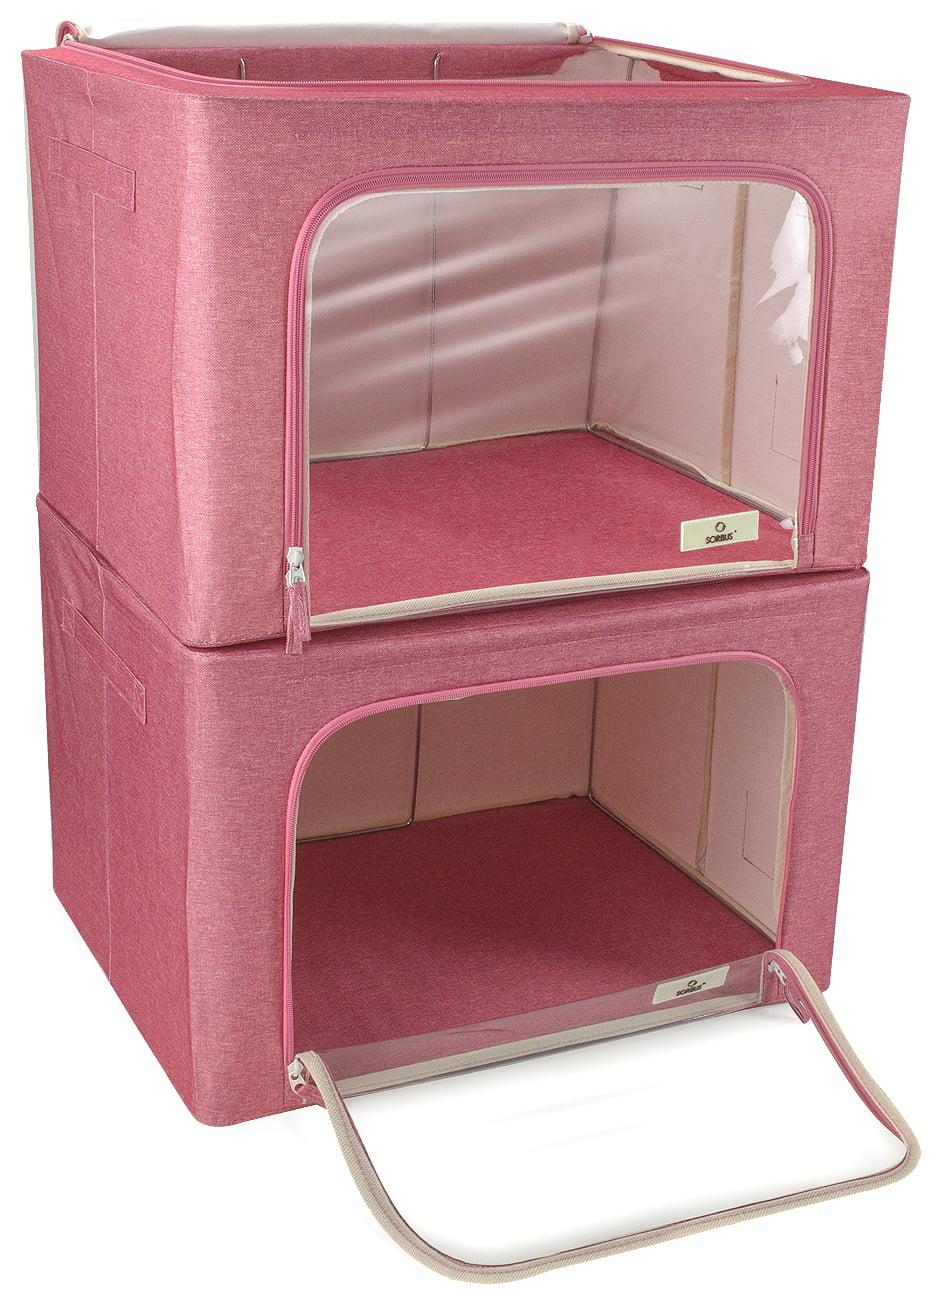 Large Storage Bag Box Foldable Stackable Organizer Bins for Clothes Shelf Closet